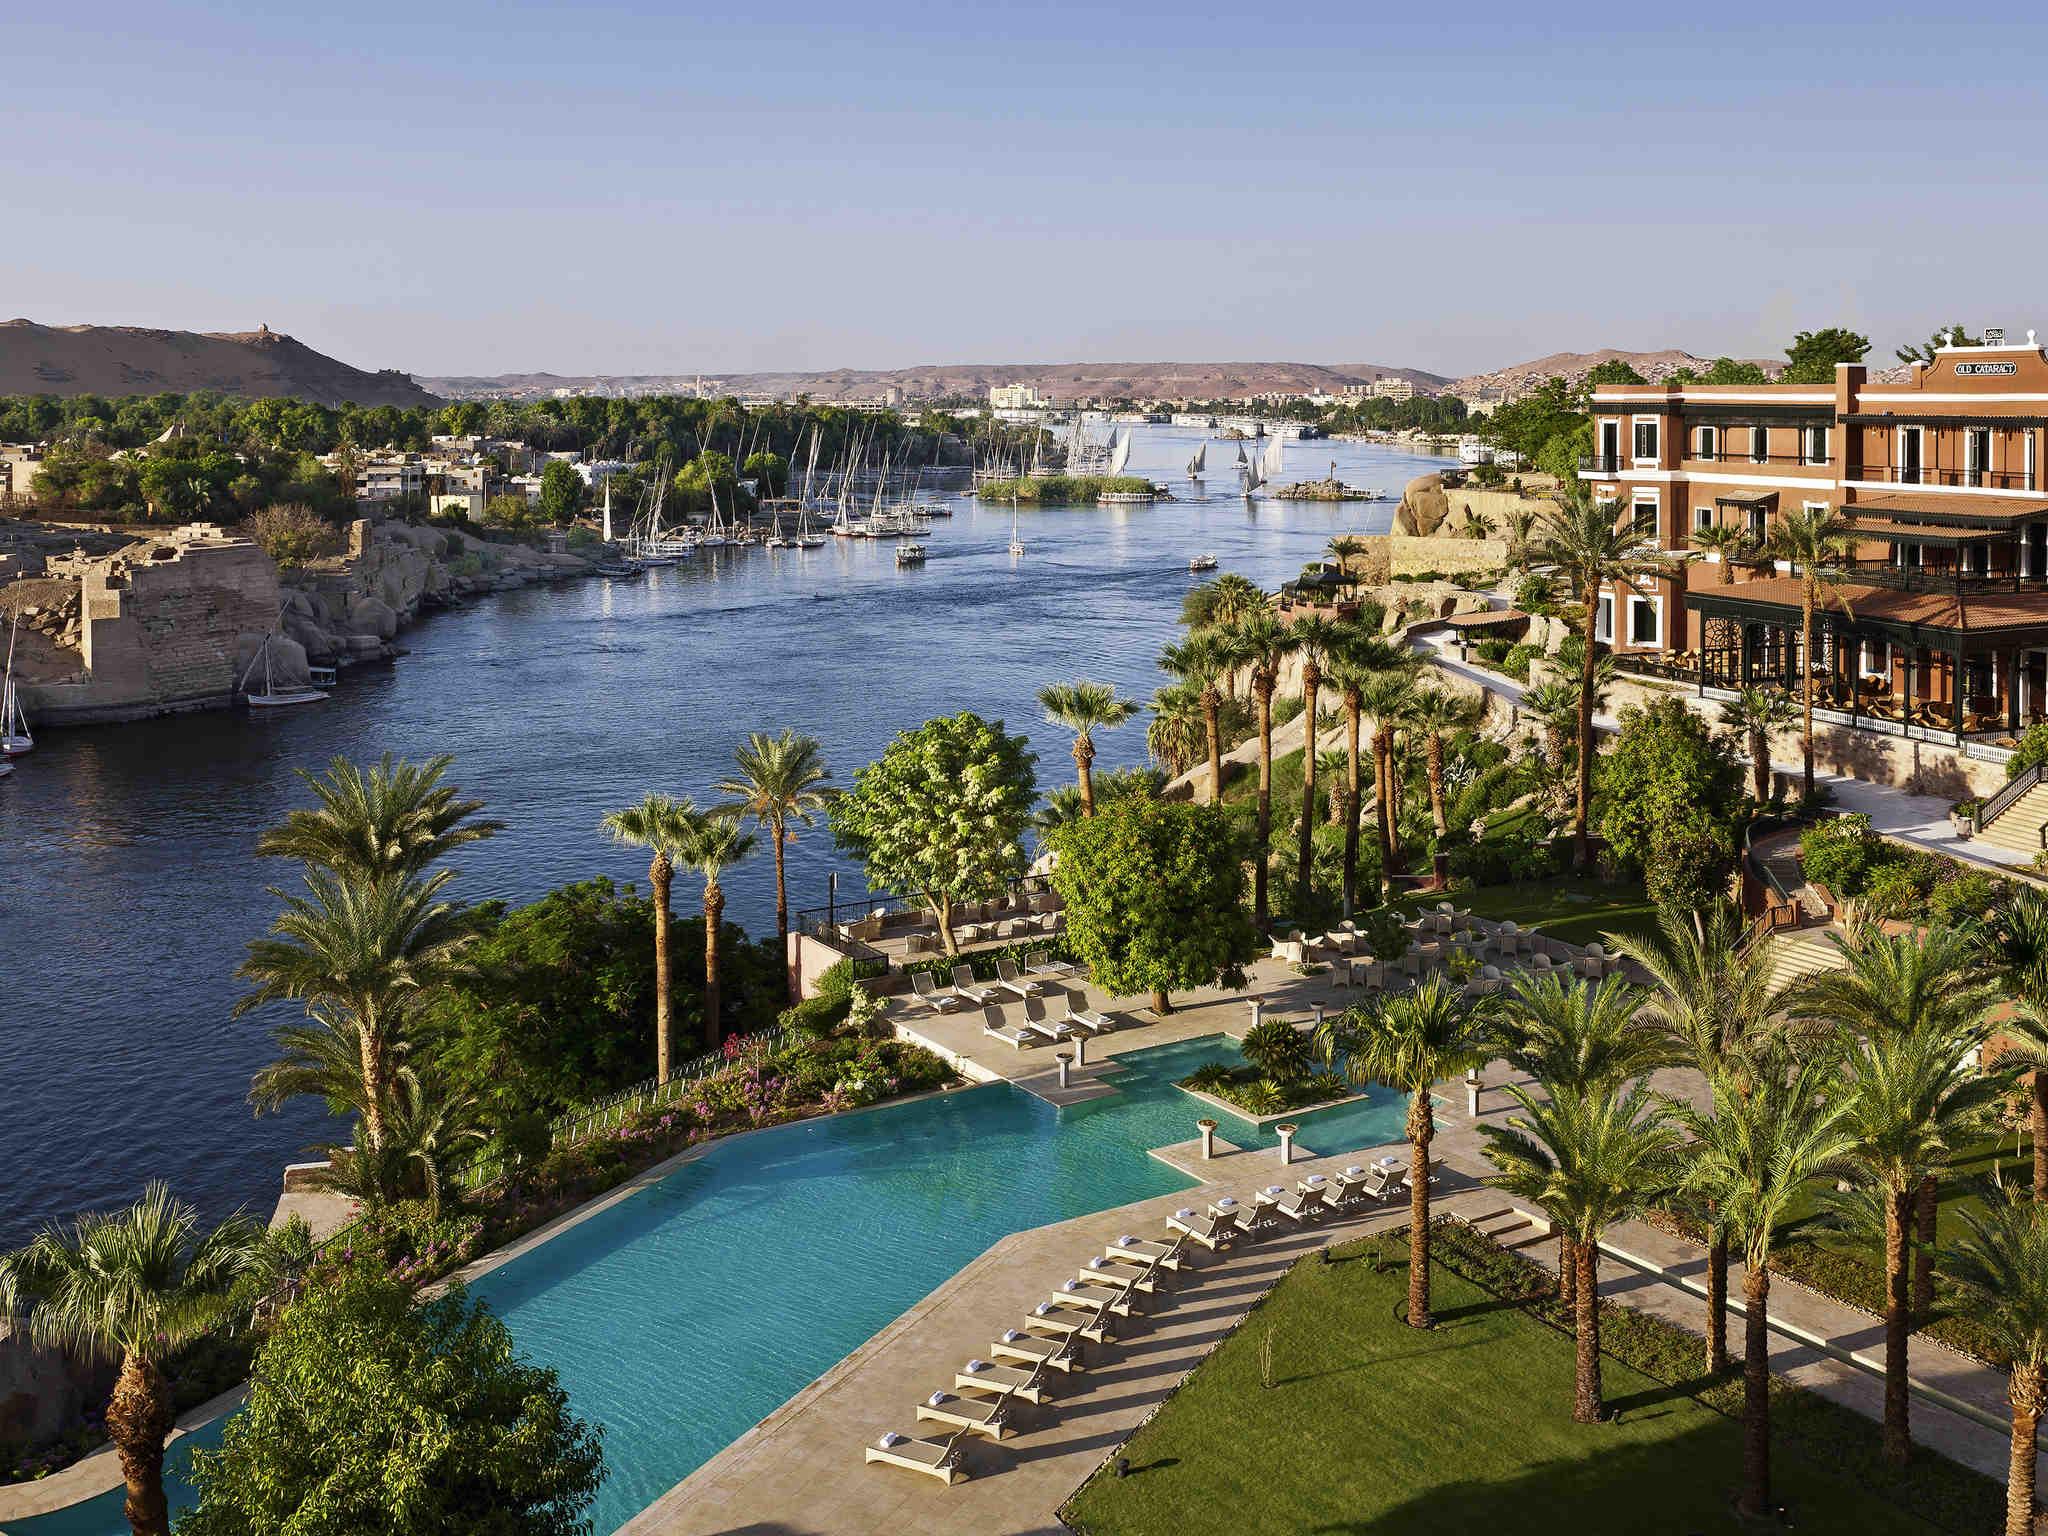 Hotel – Sofitel Legend Old Cataract Aswan